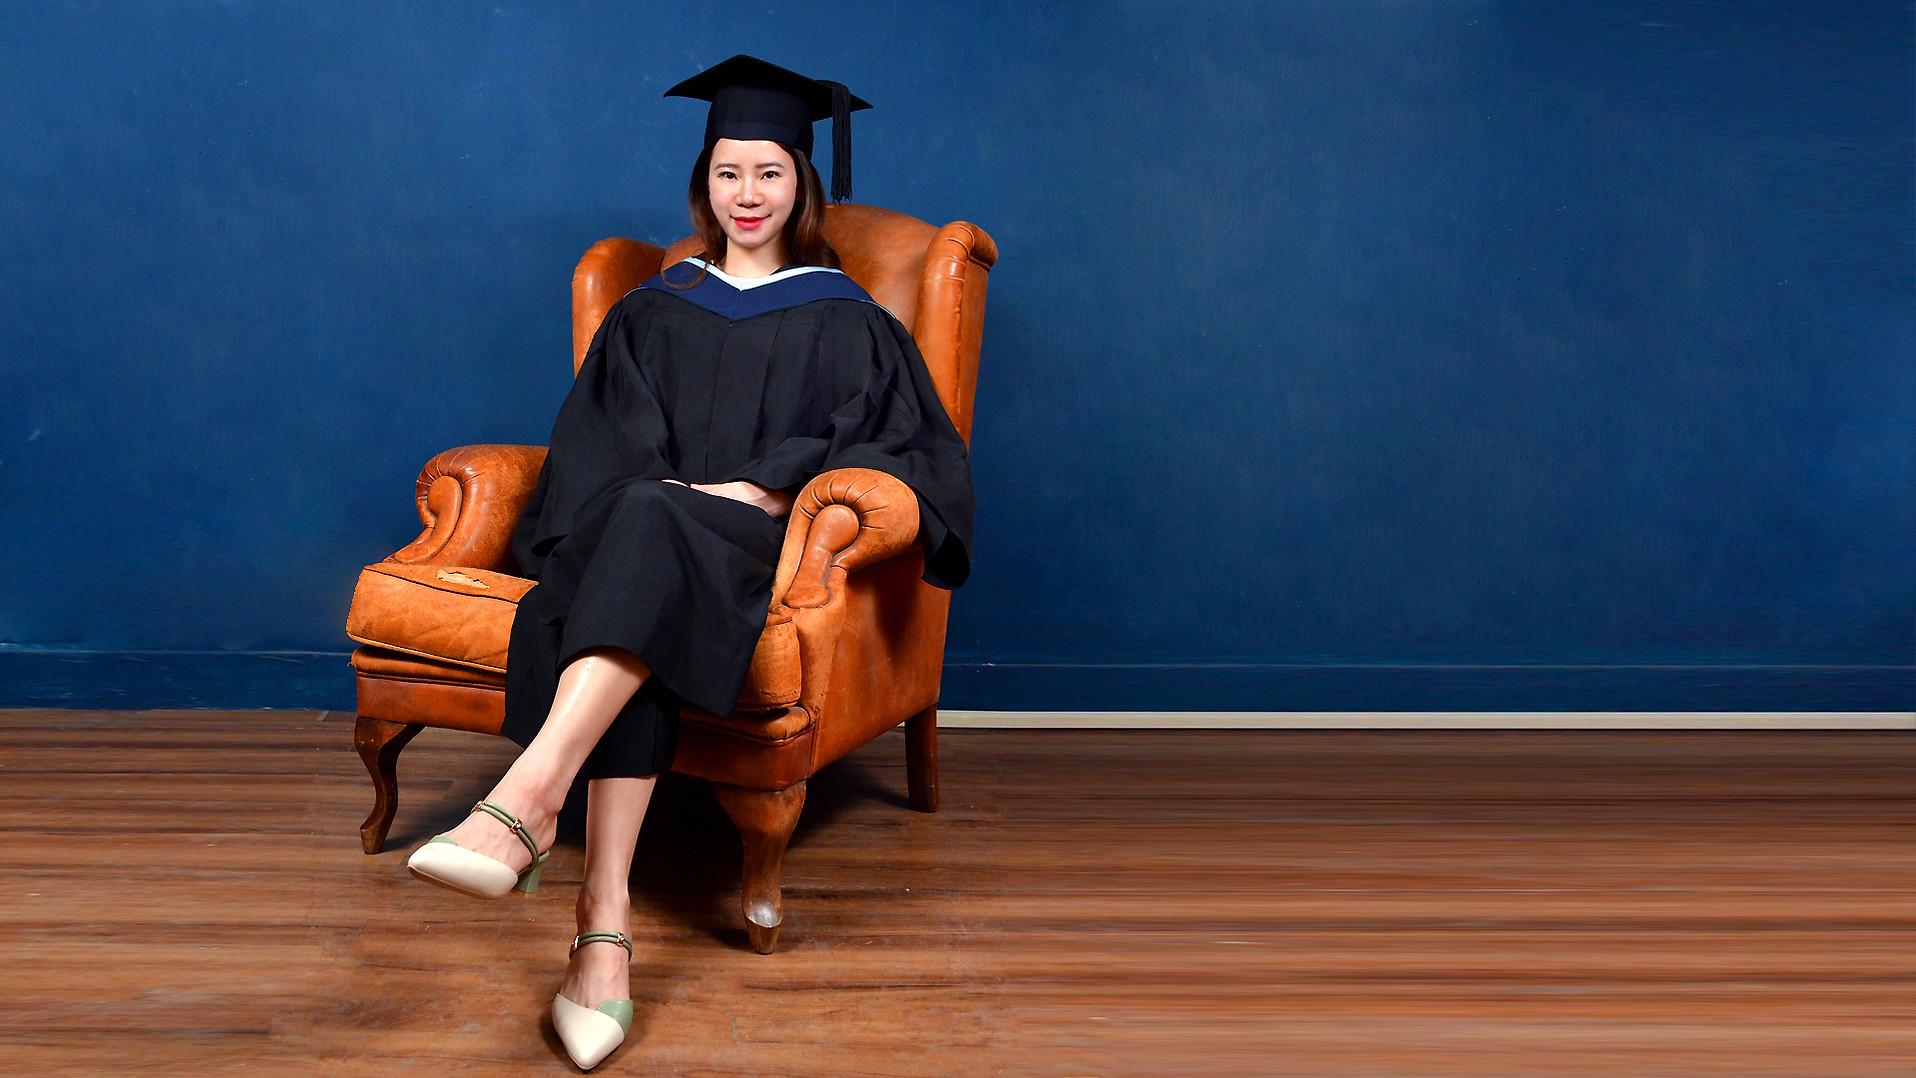 The University of Hong Kong (HKU) Master Graduation Gown | HKU Academic Dress and Academic Regalia | Rent or Buy | HKU graduation gown | HKU academic dress | HKU gown  香港大學畢業袍 |  港大畢業袍  | 學士畢業袍、碩士畢業袍、博士袍畢業袍